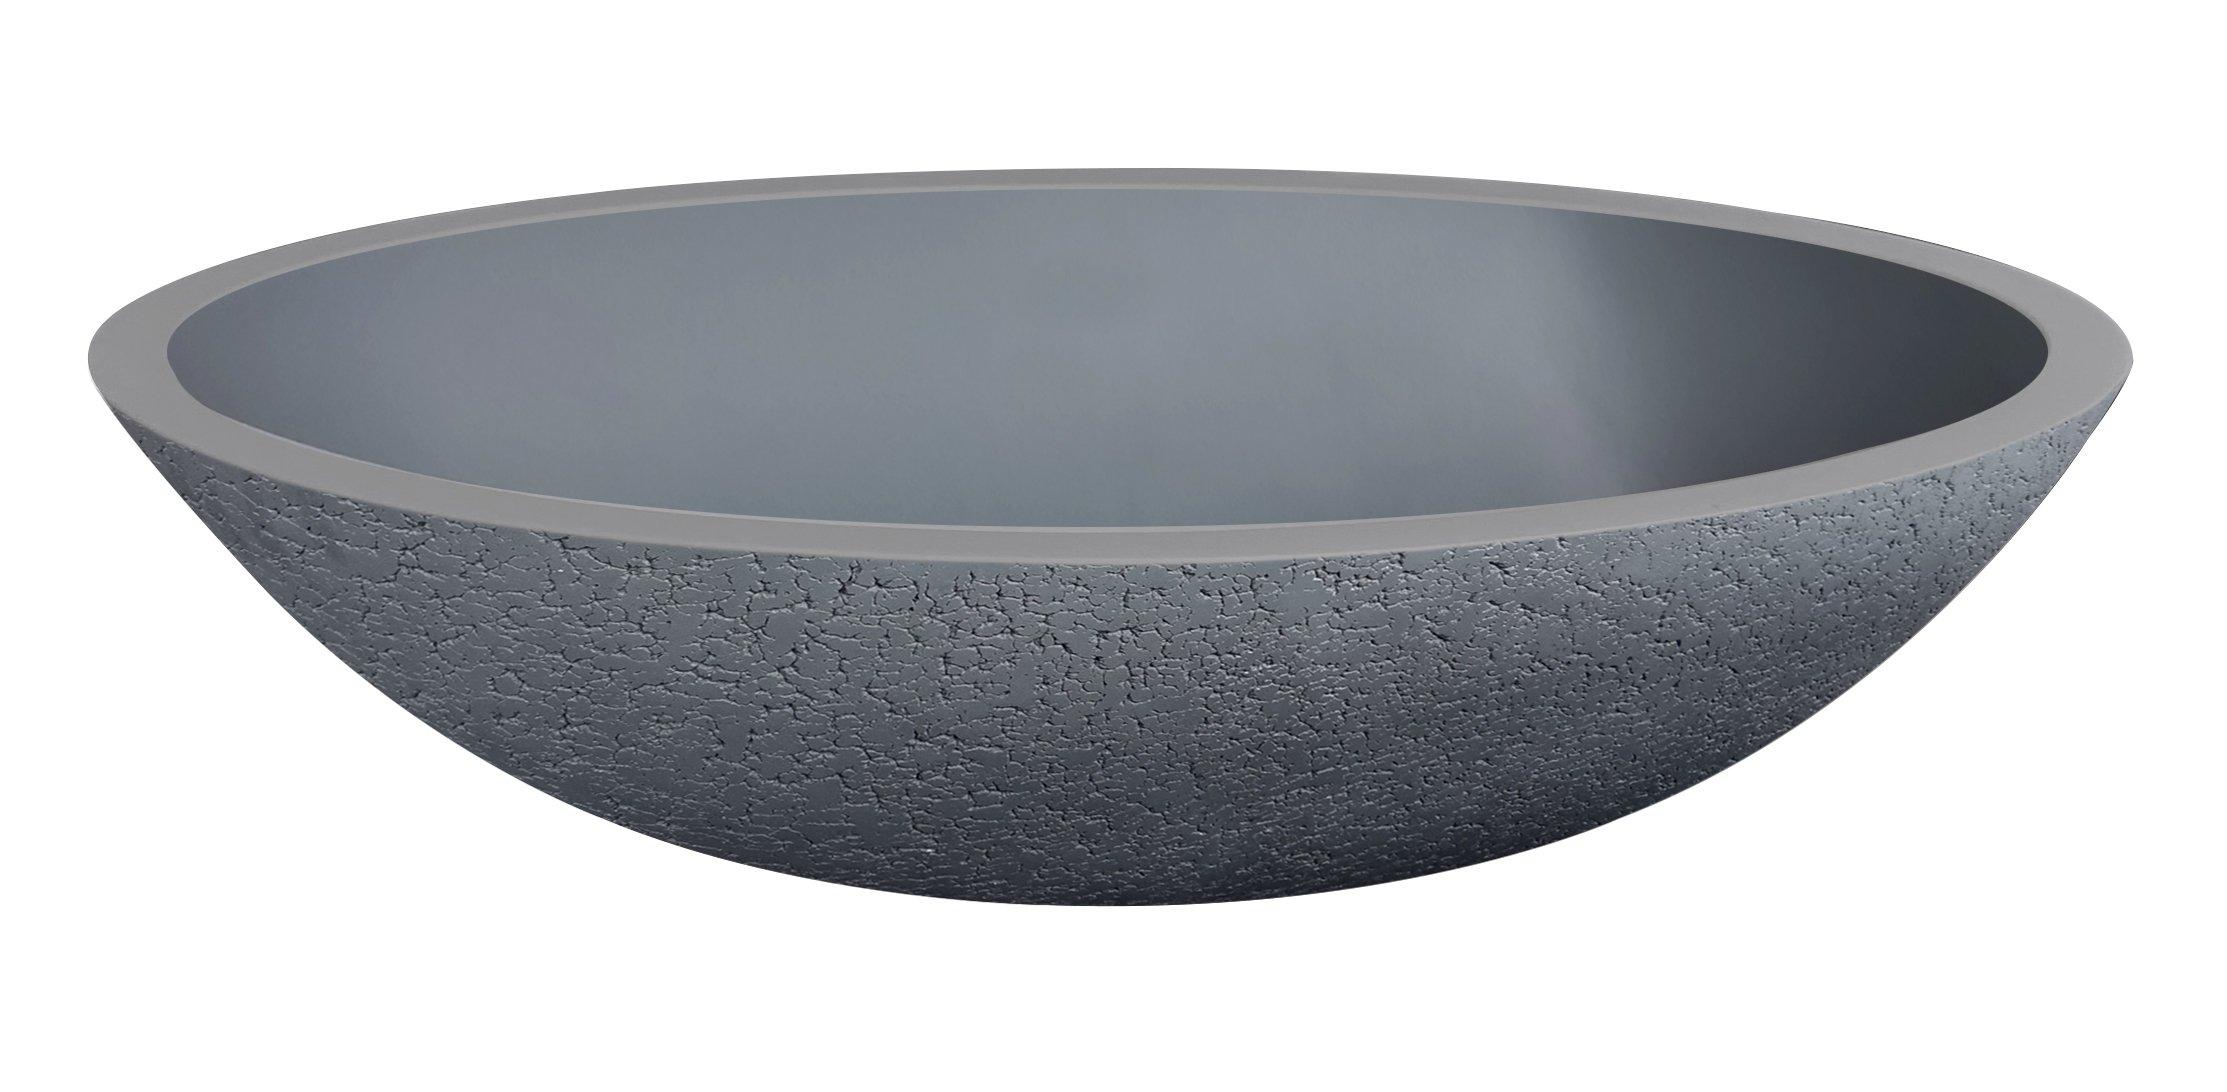 Best Design Craquele waskom ovaal Just Solid 52 cm Lava grijs